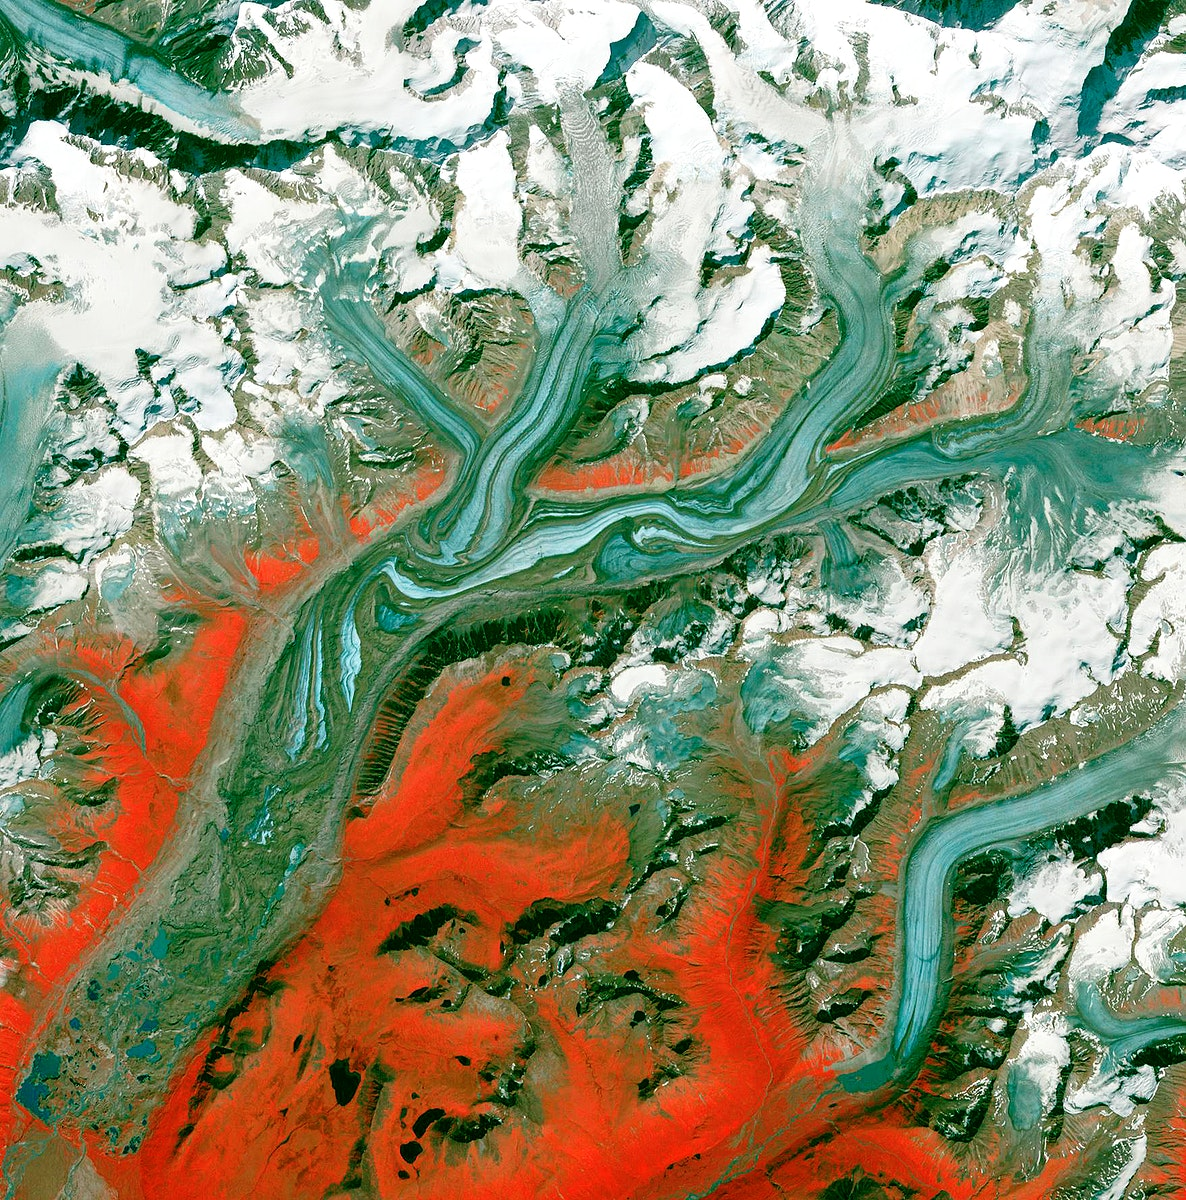 The Sustina Glacier in the Alaska Range. Original from NASA. Digitally enhanced by rawpixel.